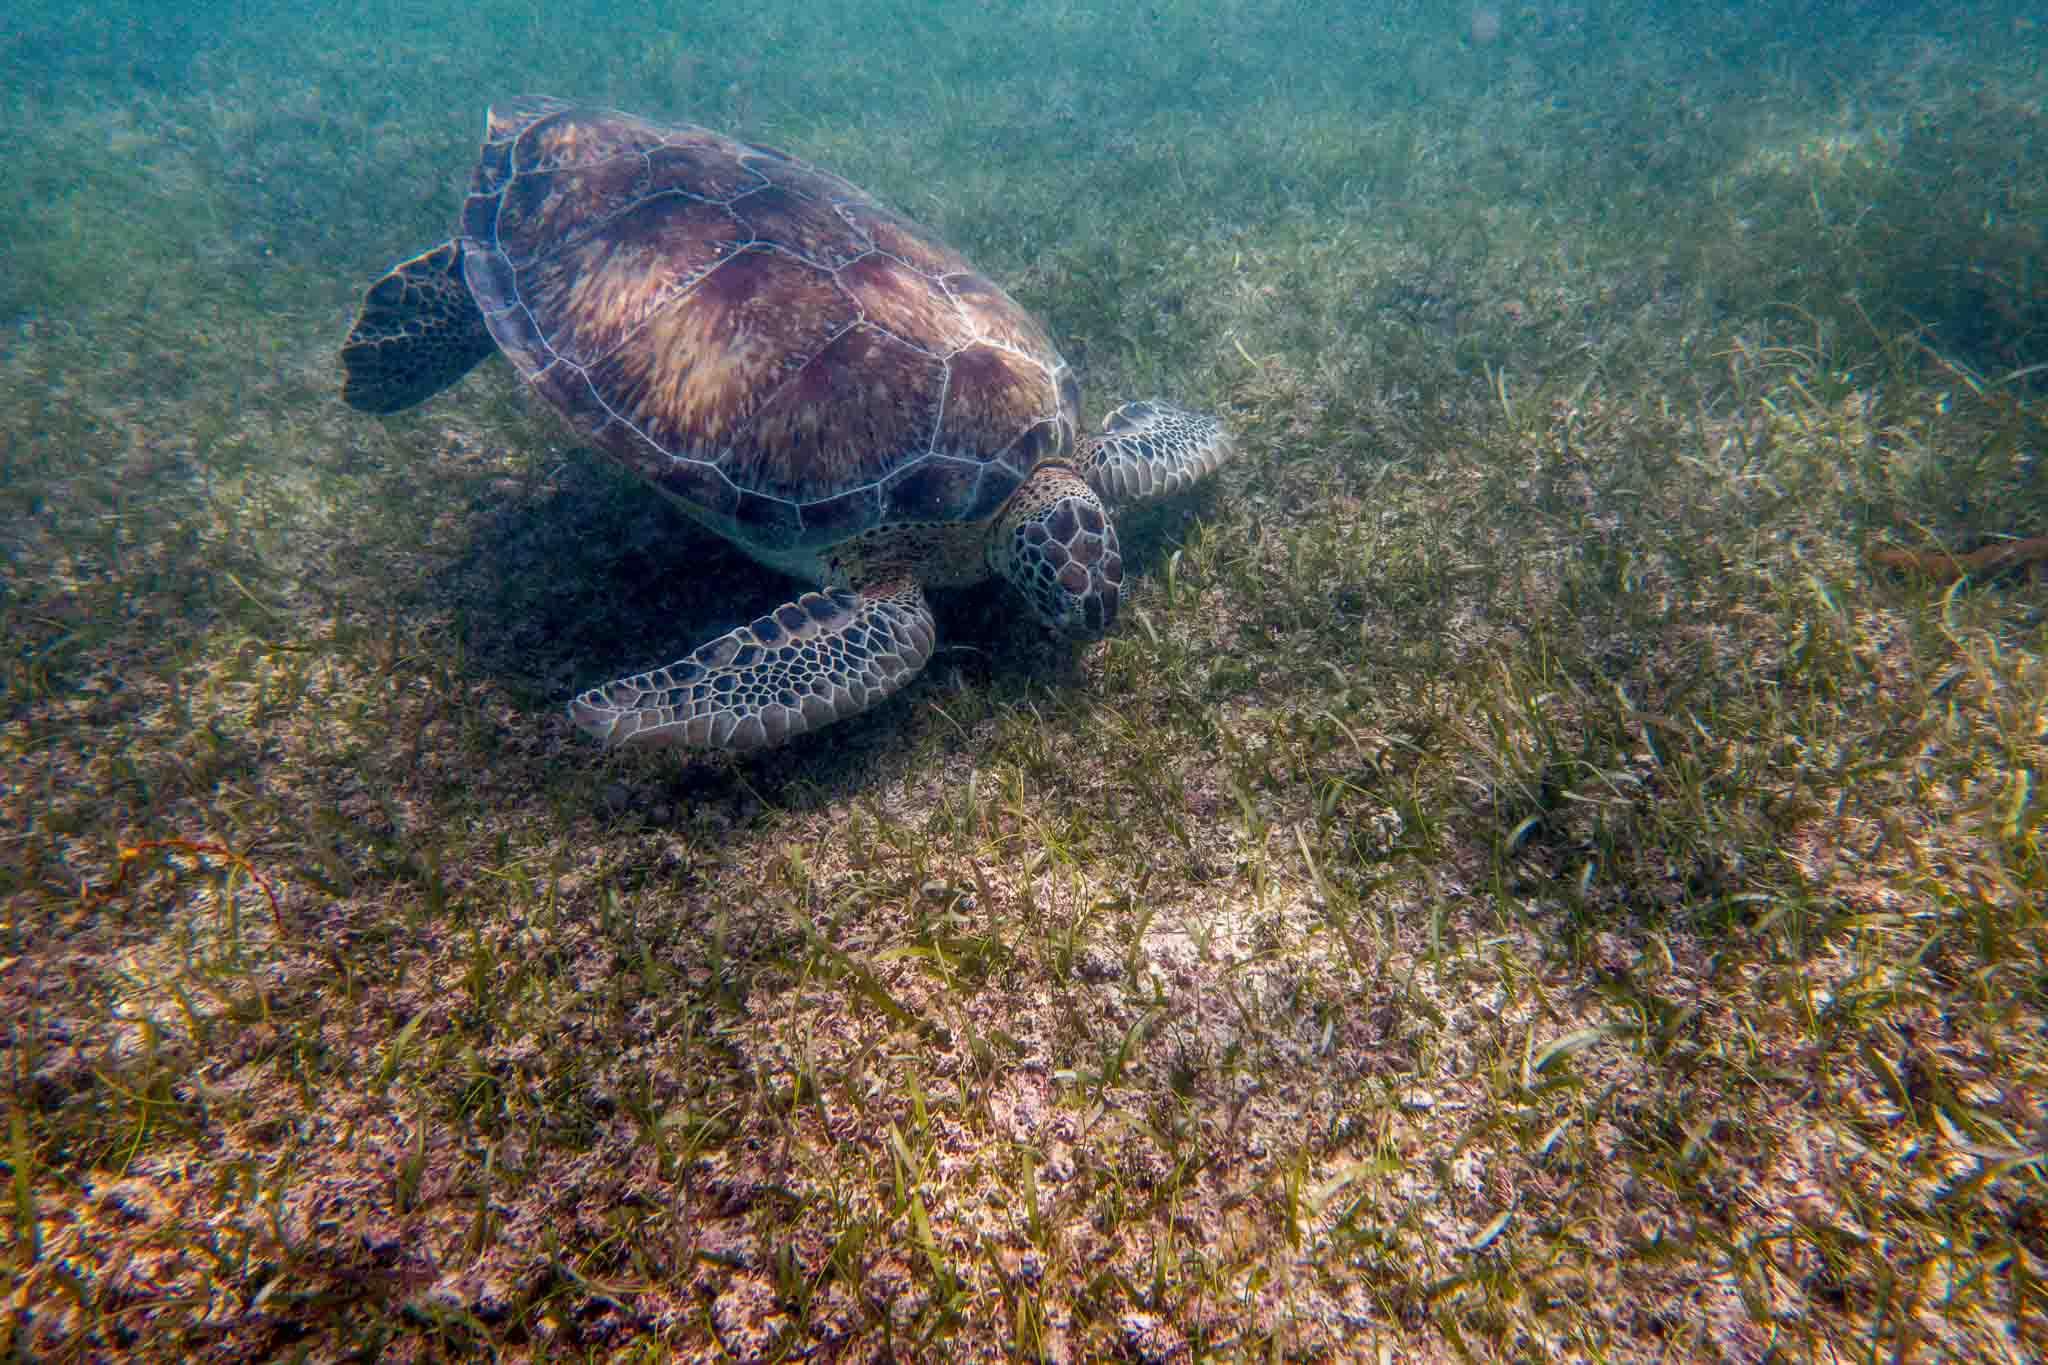 Akumal turtles feeding on the sea grass underwater